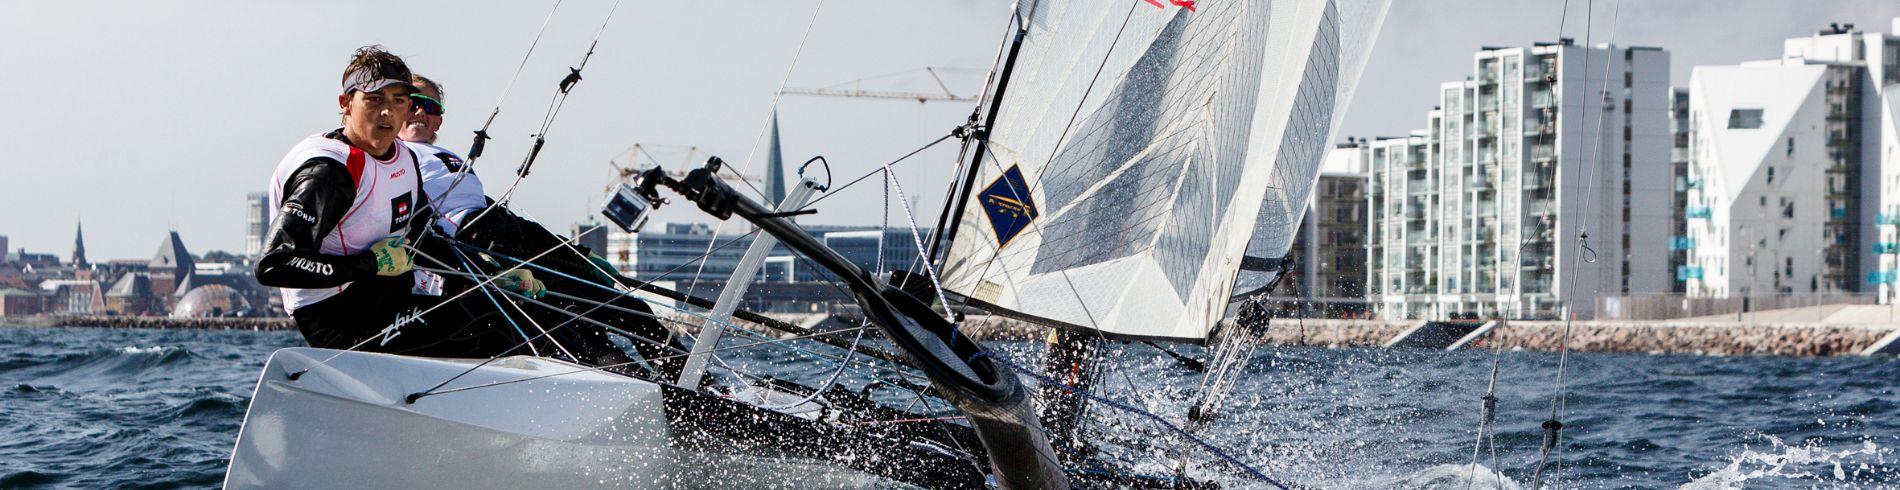 Hempel Sailing World Championships Aarhus 2018 cover image